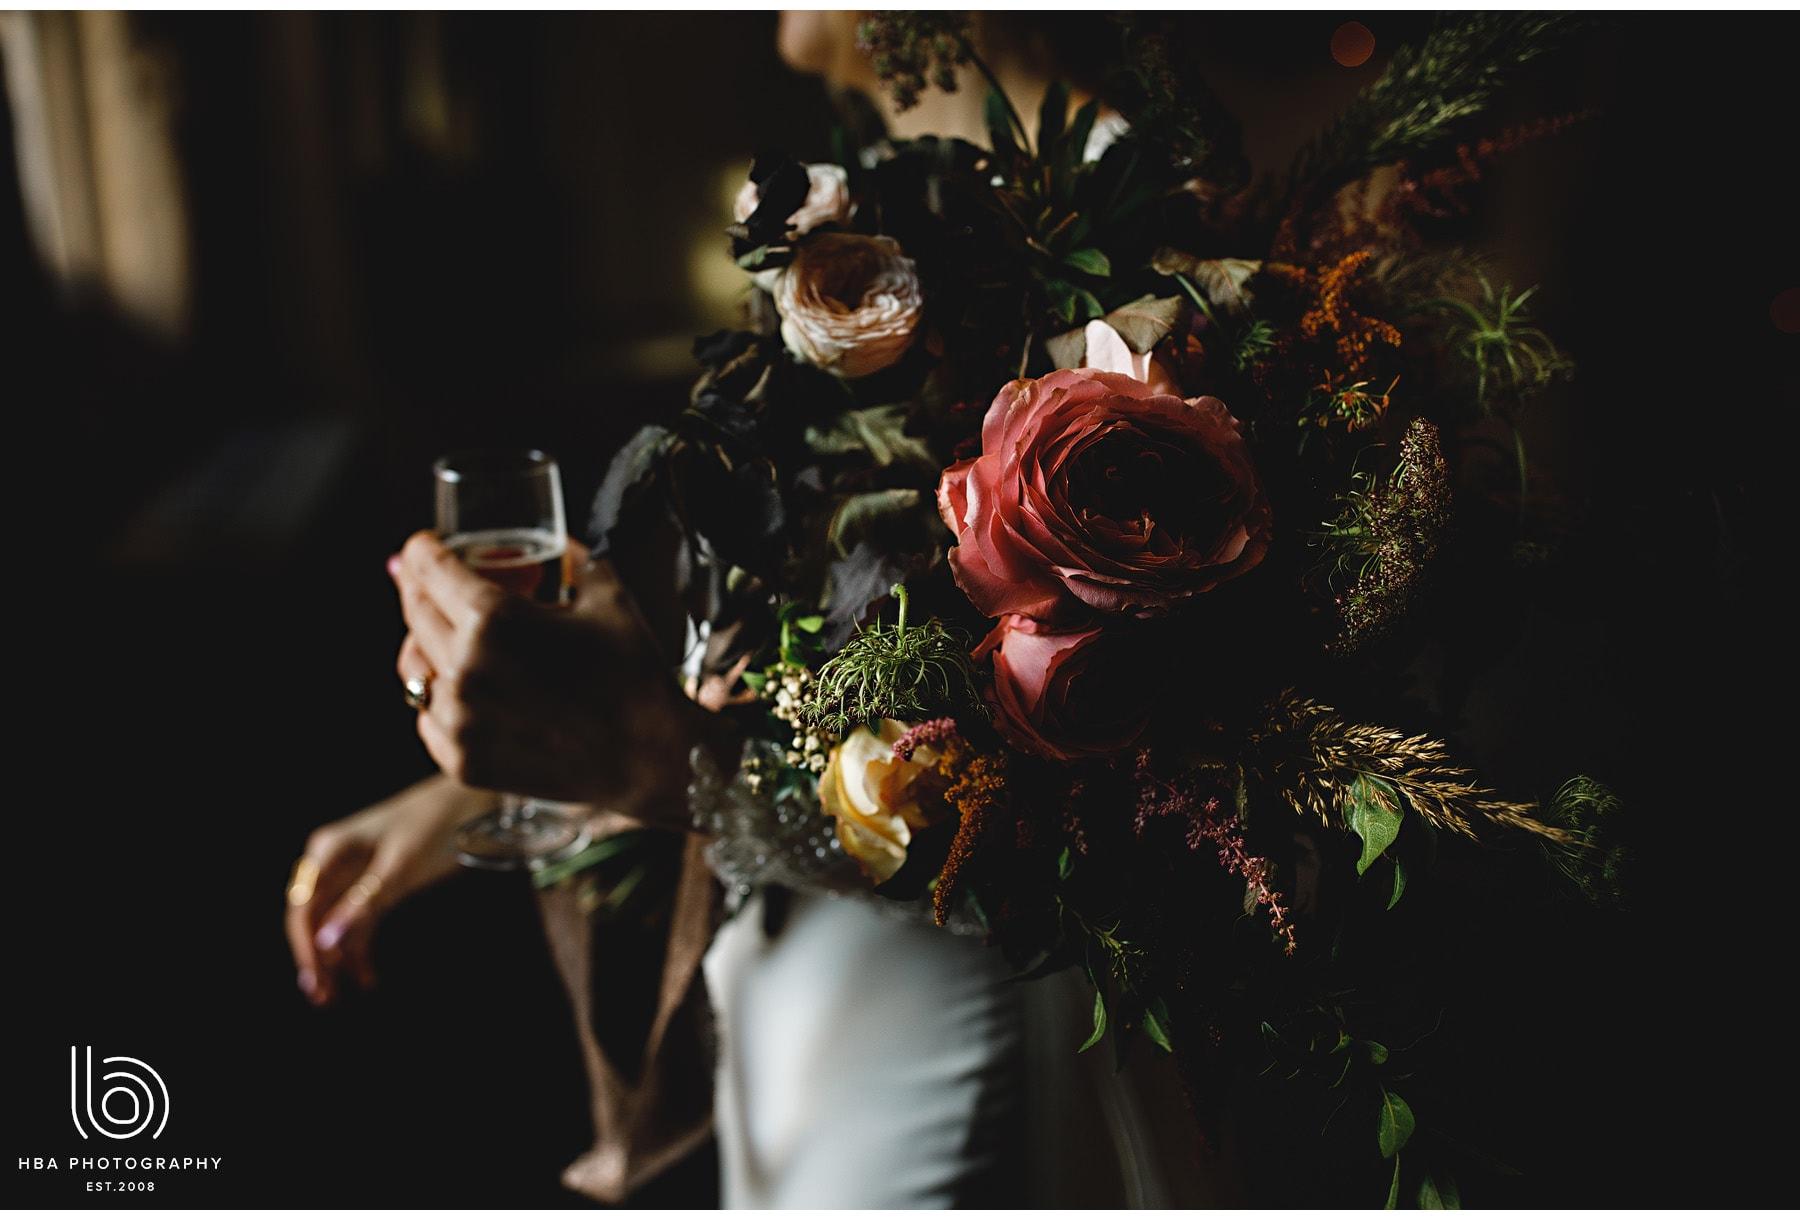 the bride's beautiful bouquet